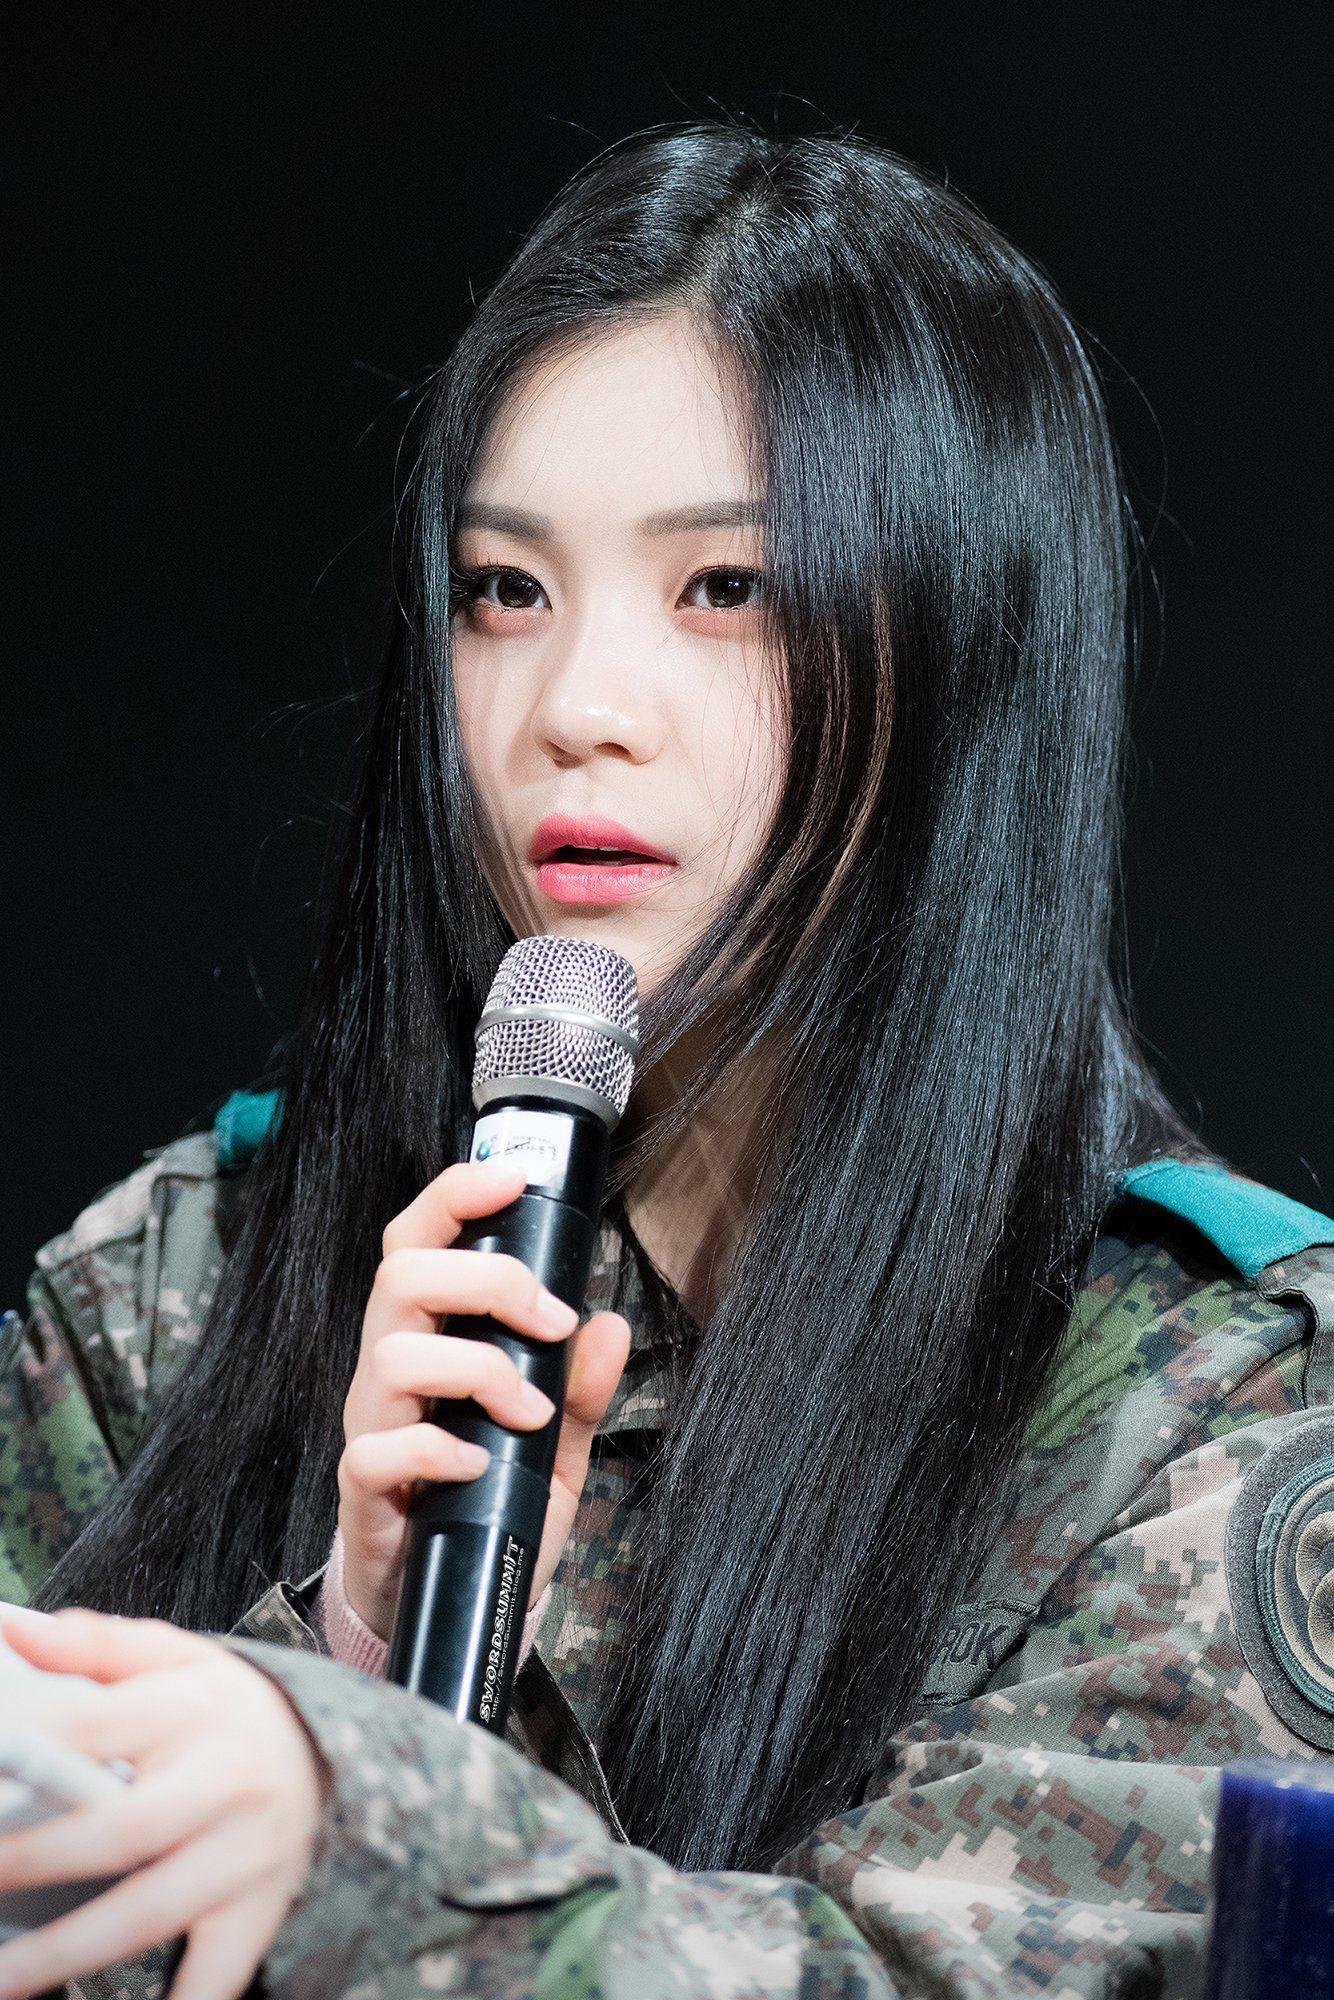 Https Pbs Twimg Com Media D5l1mbjvuaa8thb Jpg Orig Kpop Girl Groups Kpop Girls Girl